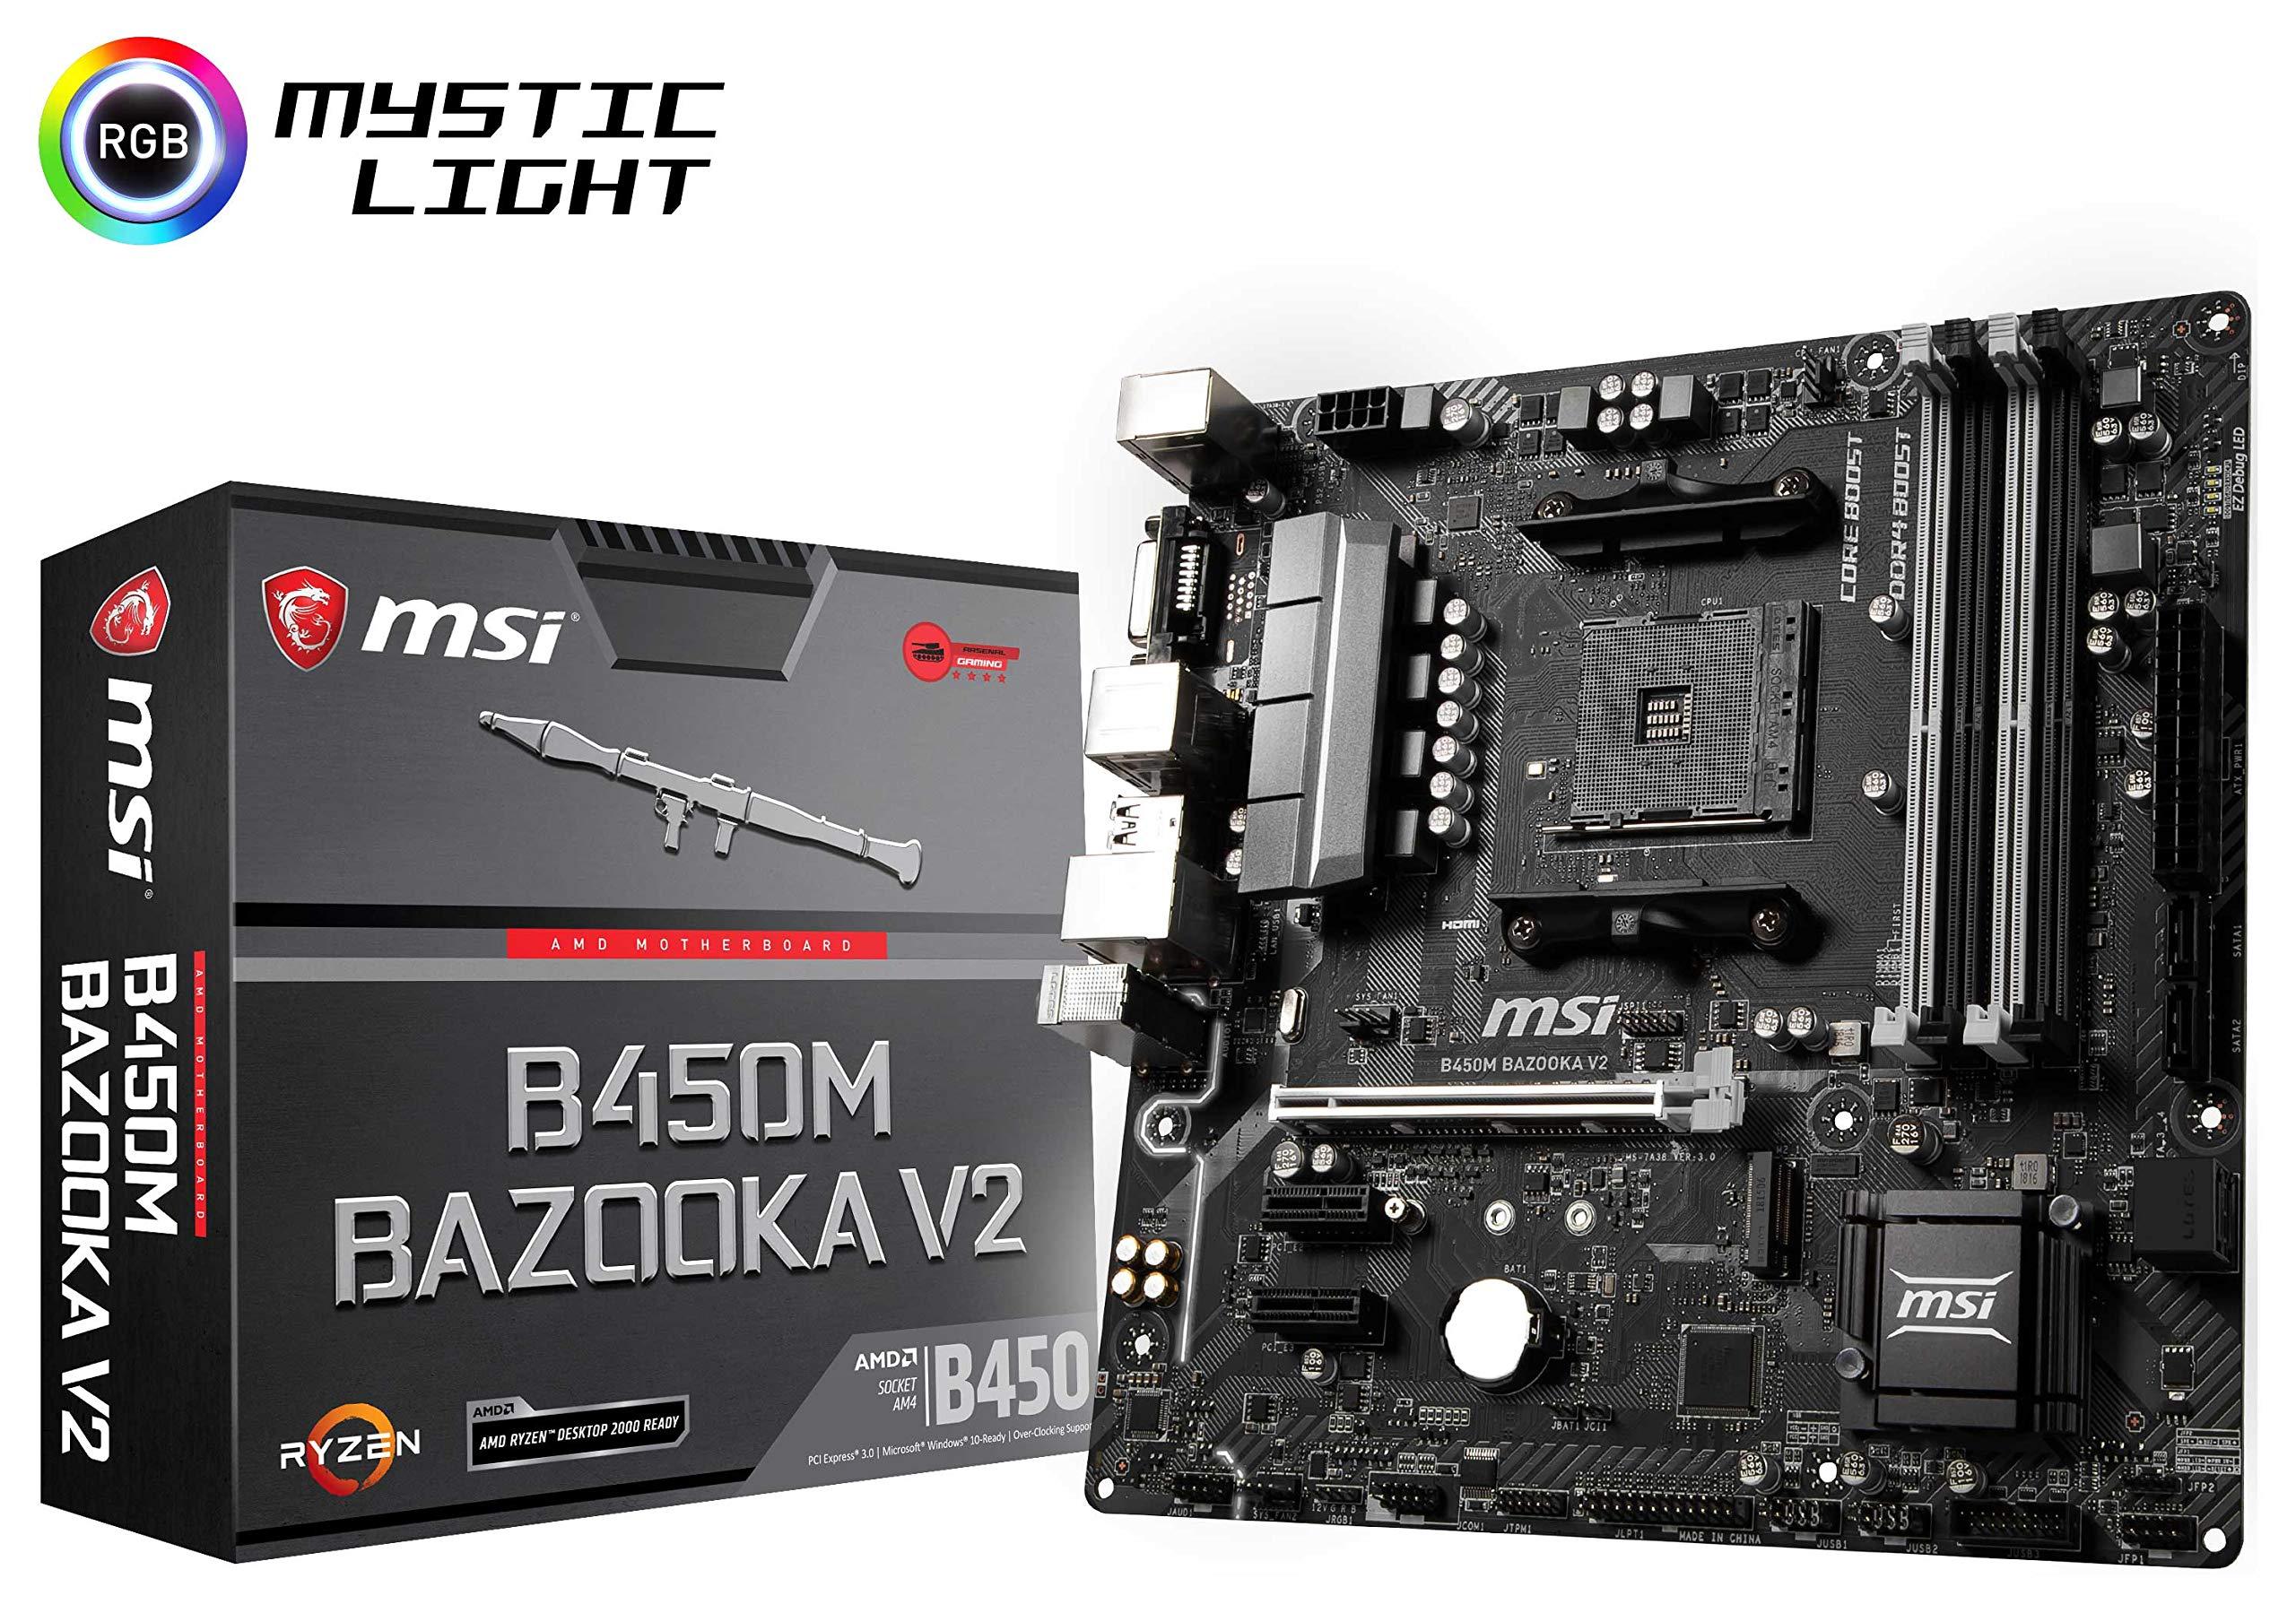 MSI Arsenal Gaming AMD Ryzen 1st and 2ND Gen AM4 M.2 USB 3 DDR4 DVI HDMI Micro-ATX Motherboard (B450M Bazooka V2) by MSI